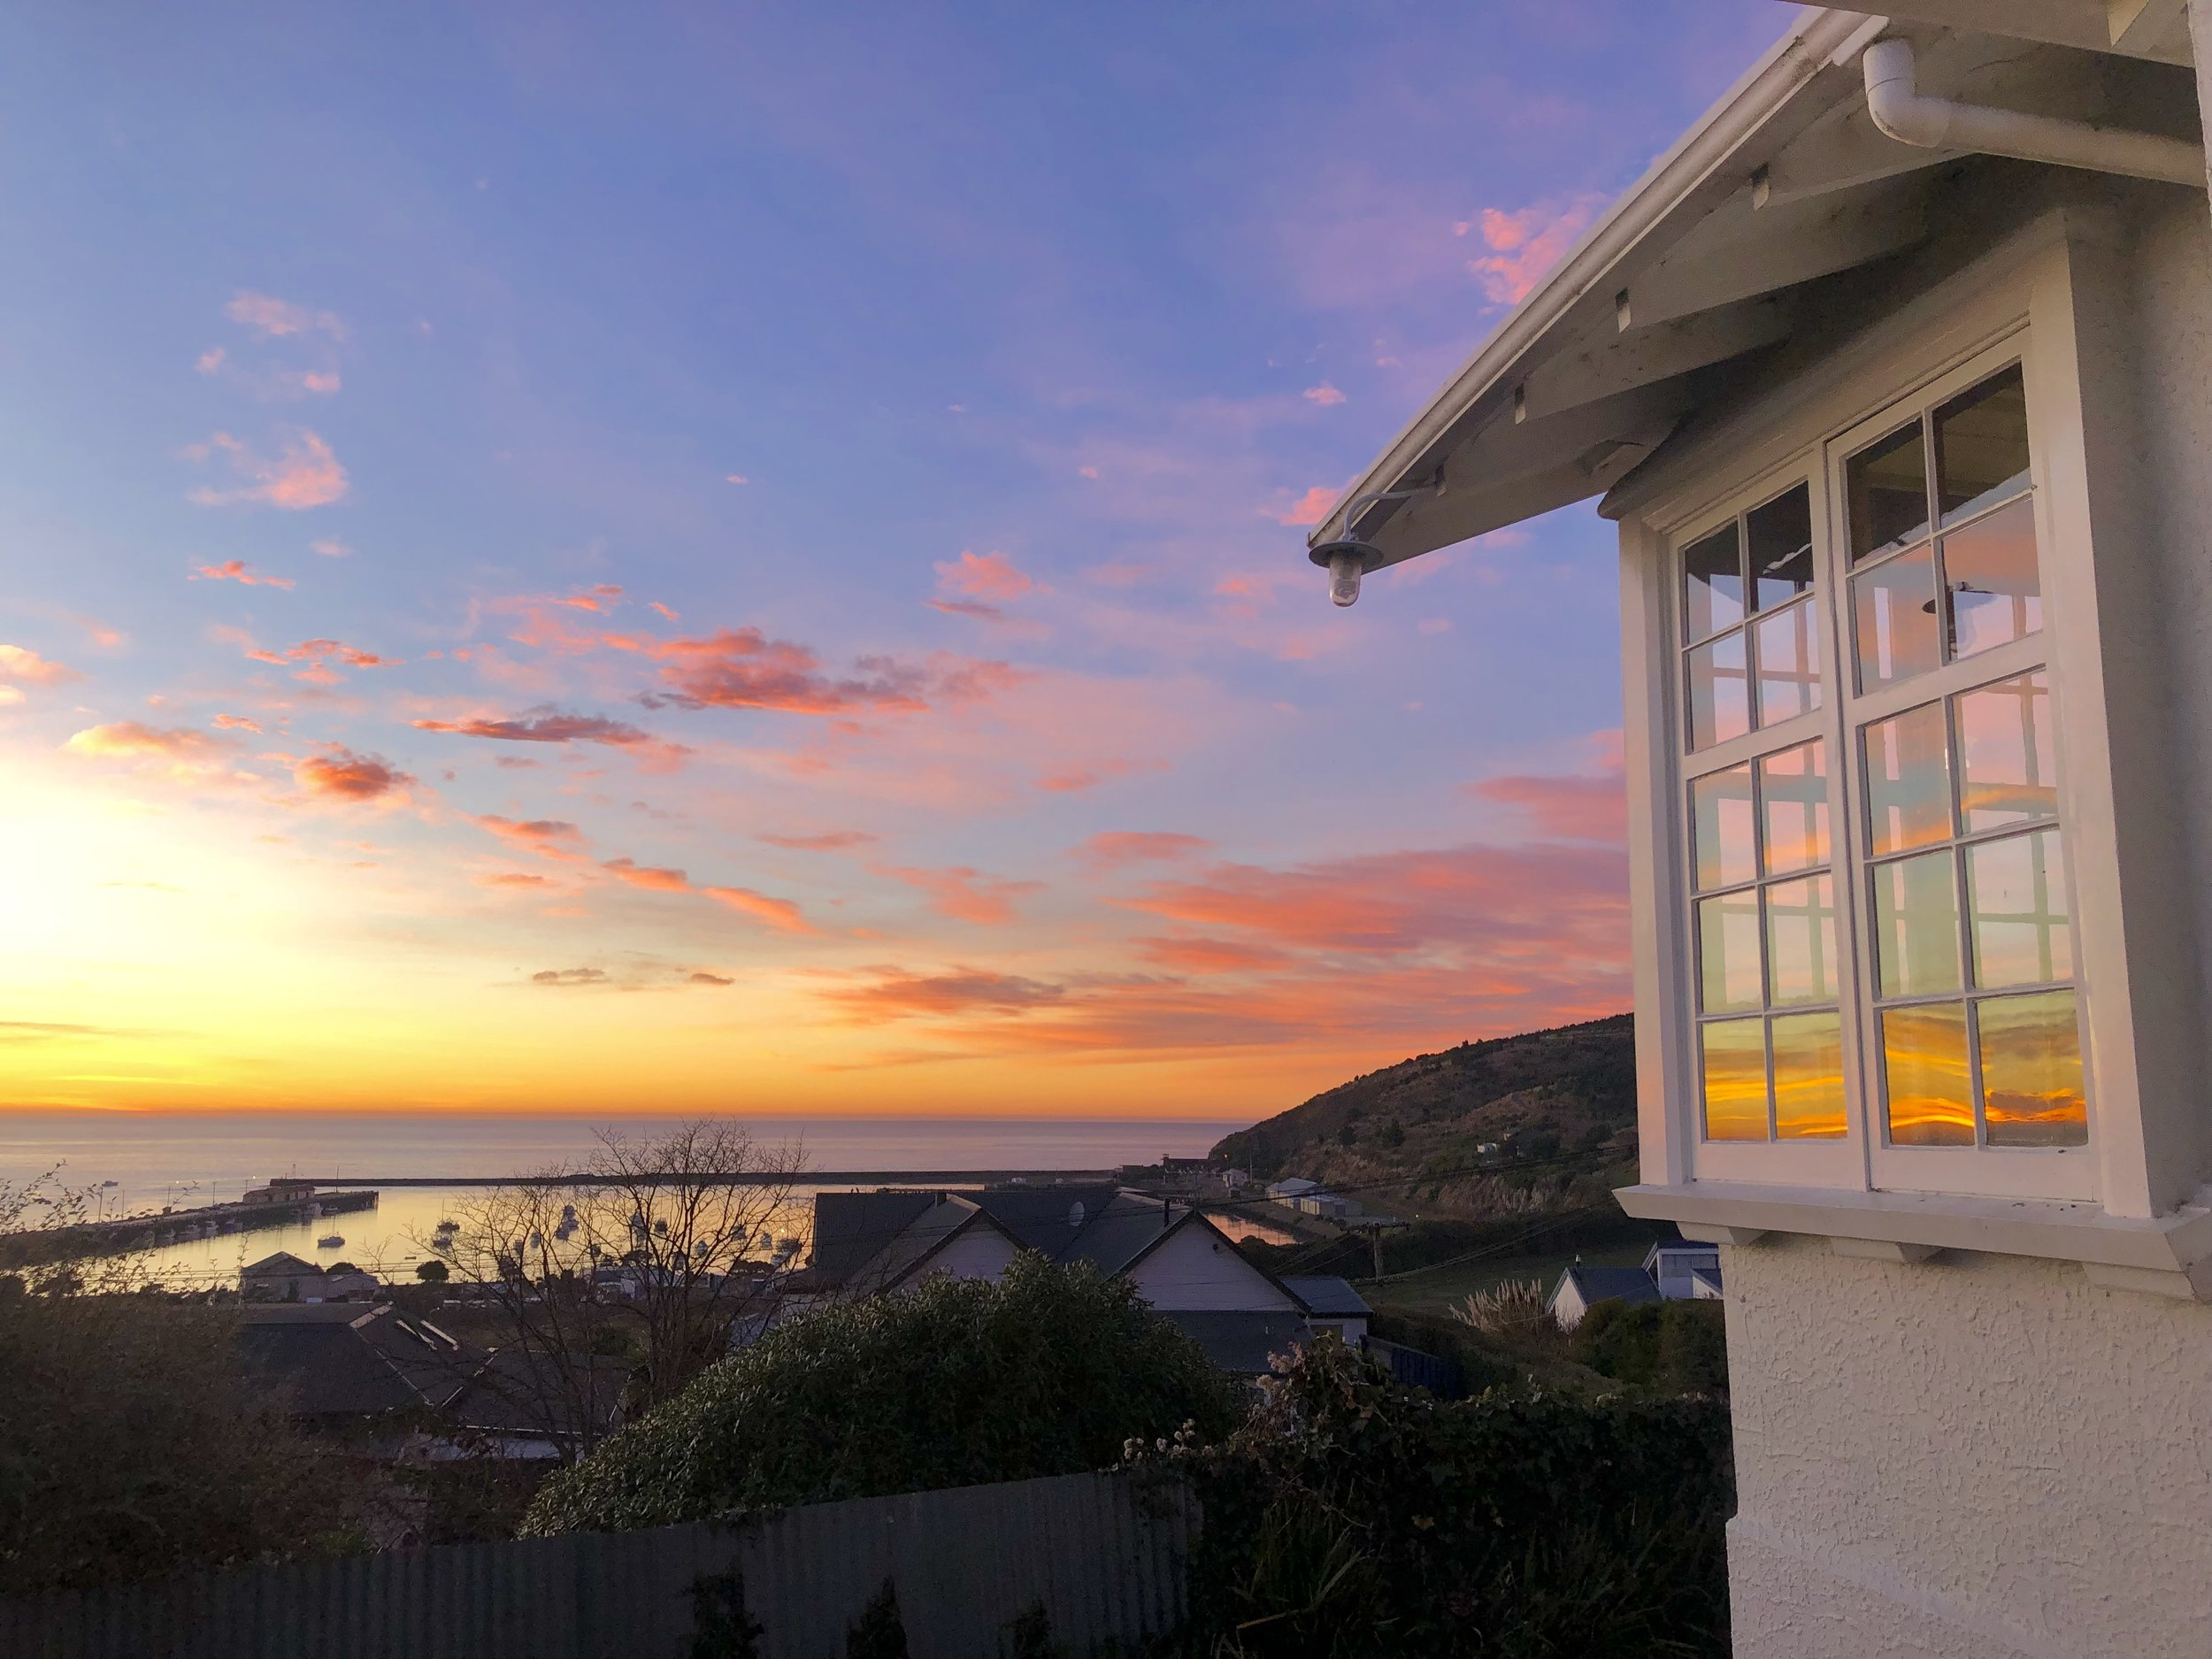 Sunrise from my accommodation